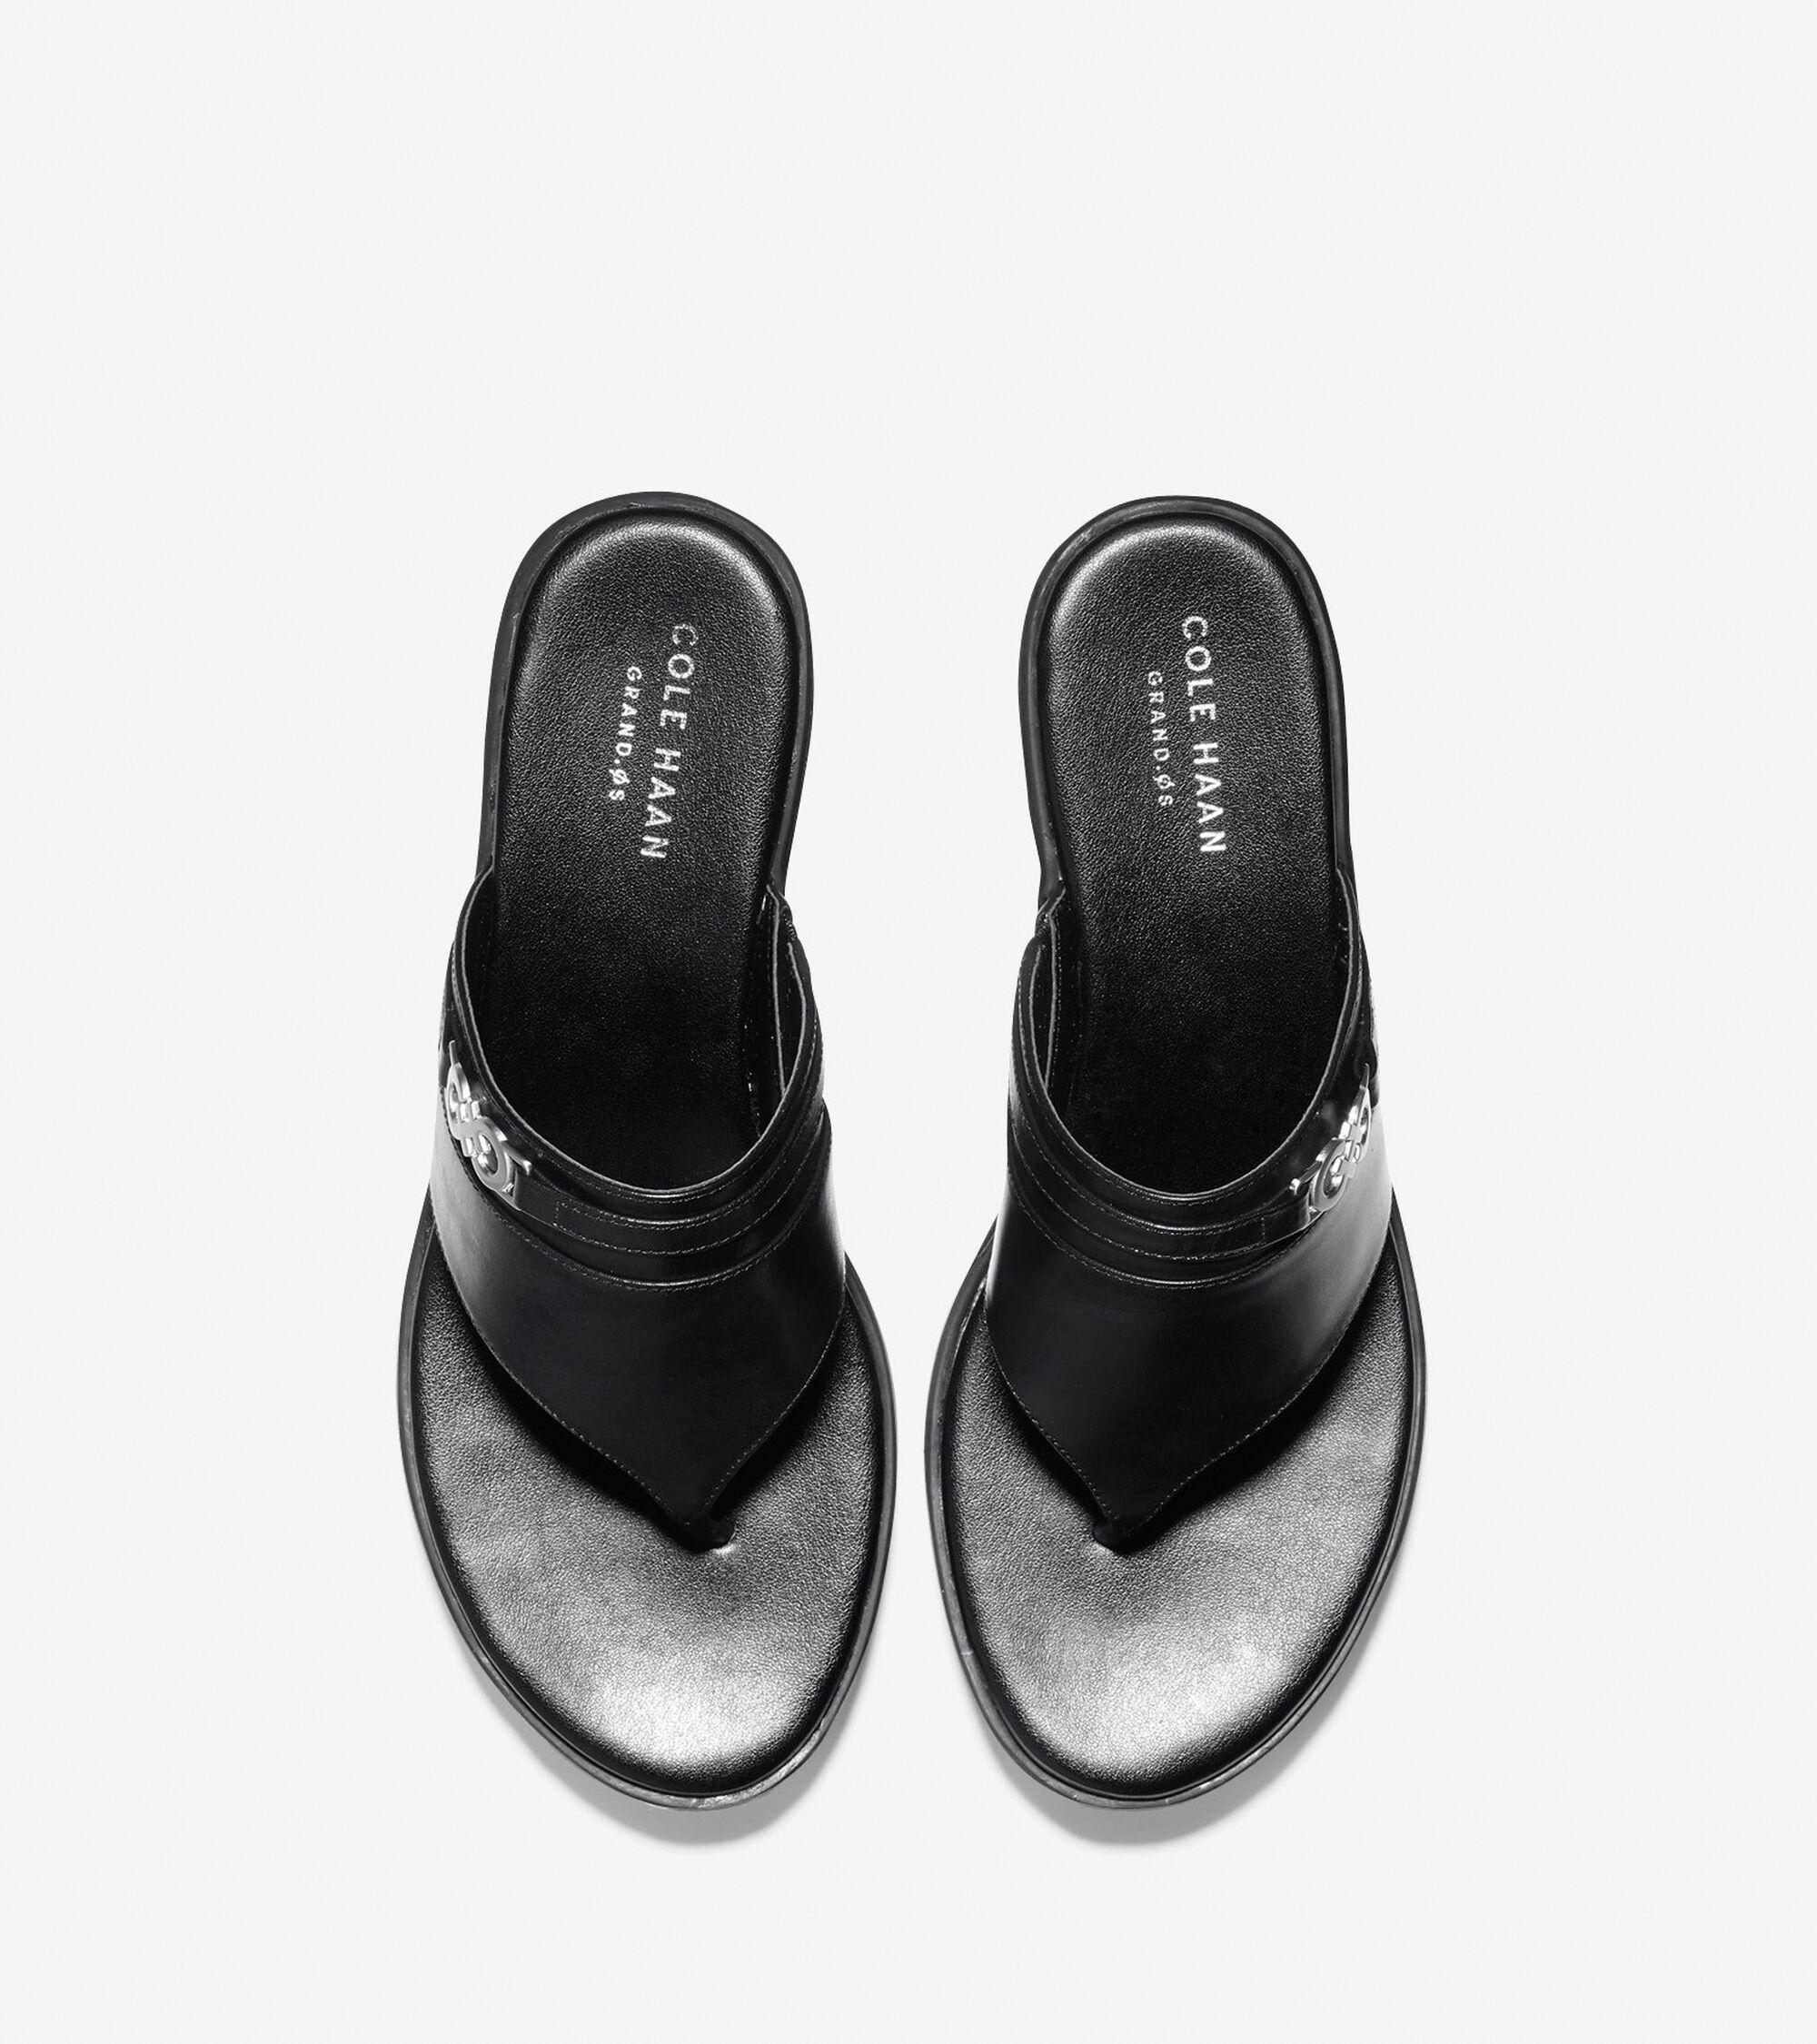 air khaki aviation foto max comforter sandals women model comfort thong for nike decathlon